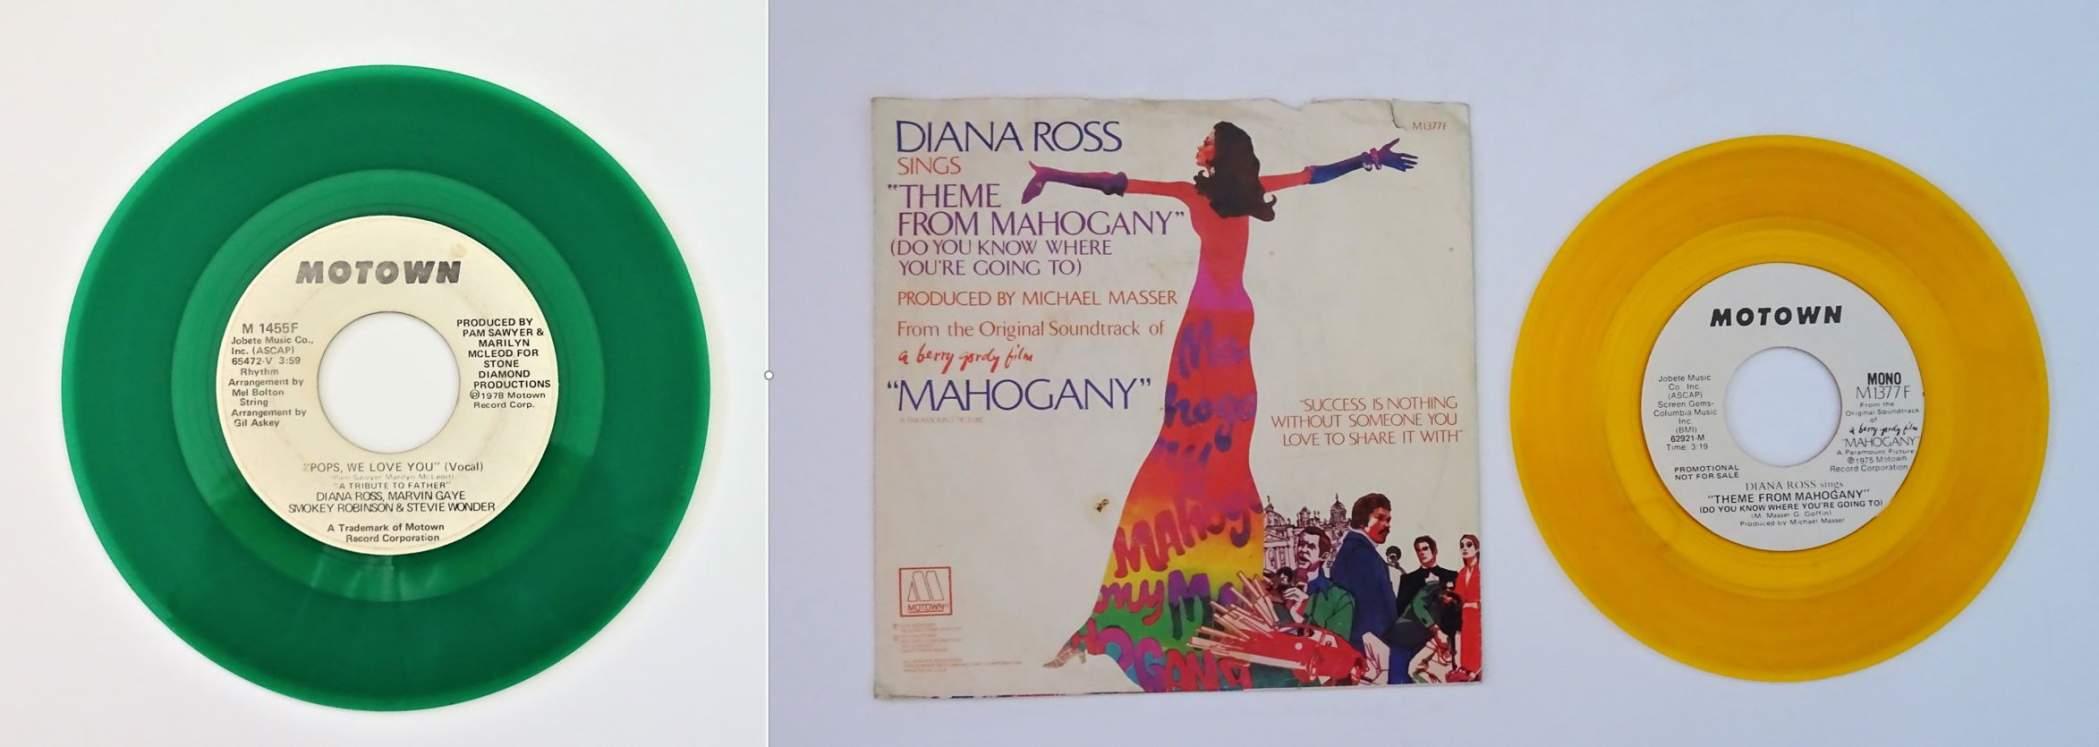 Name:  vinyl.jpg Views: 468 Size:  94.6 KB